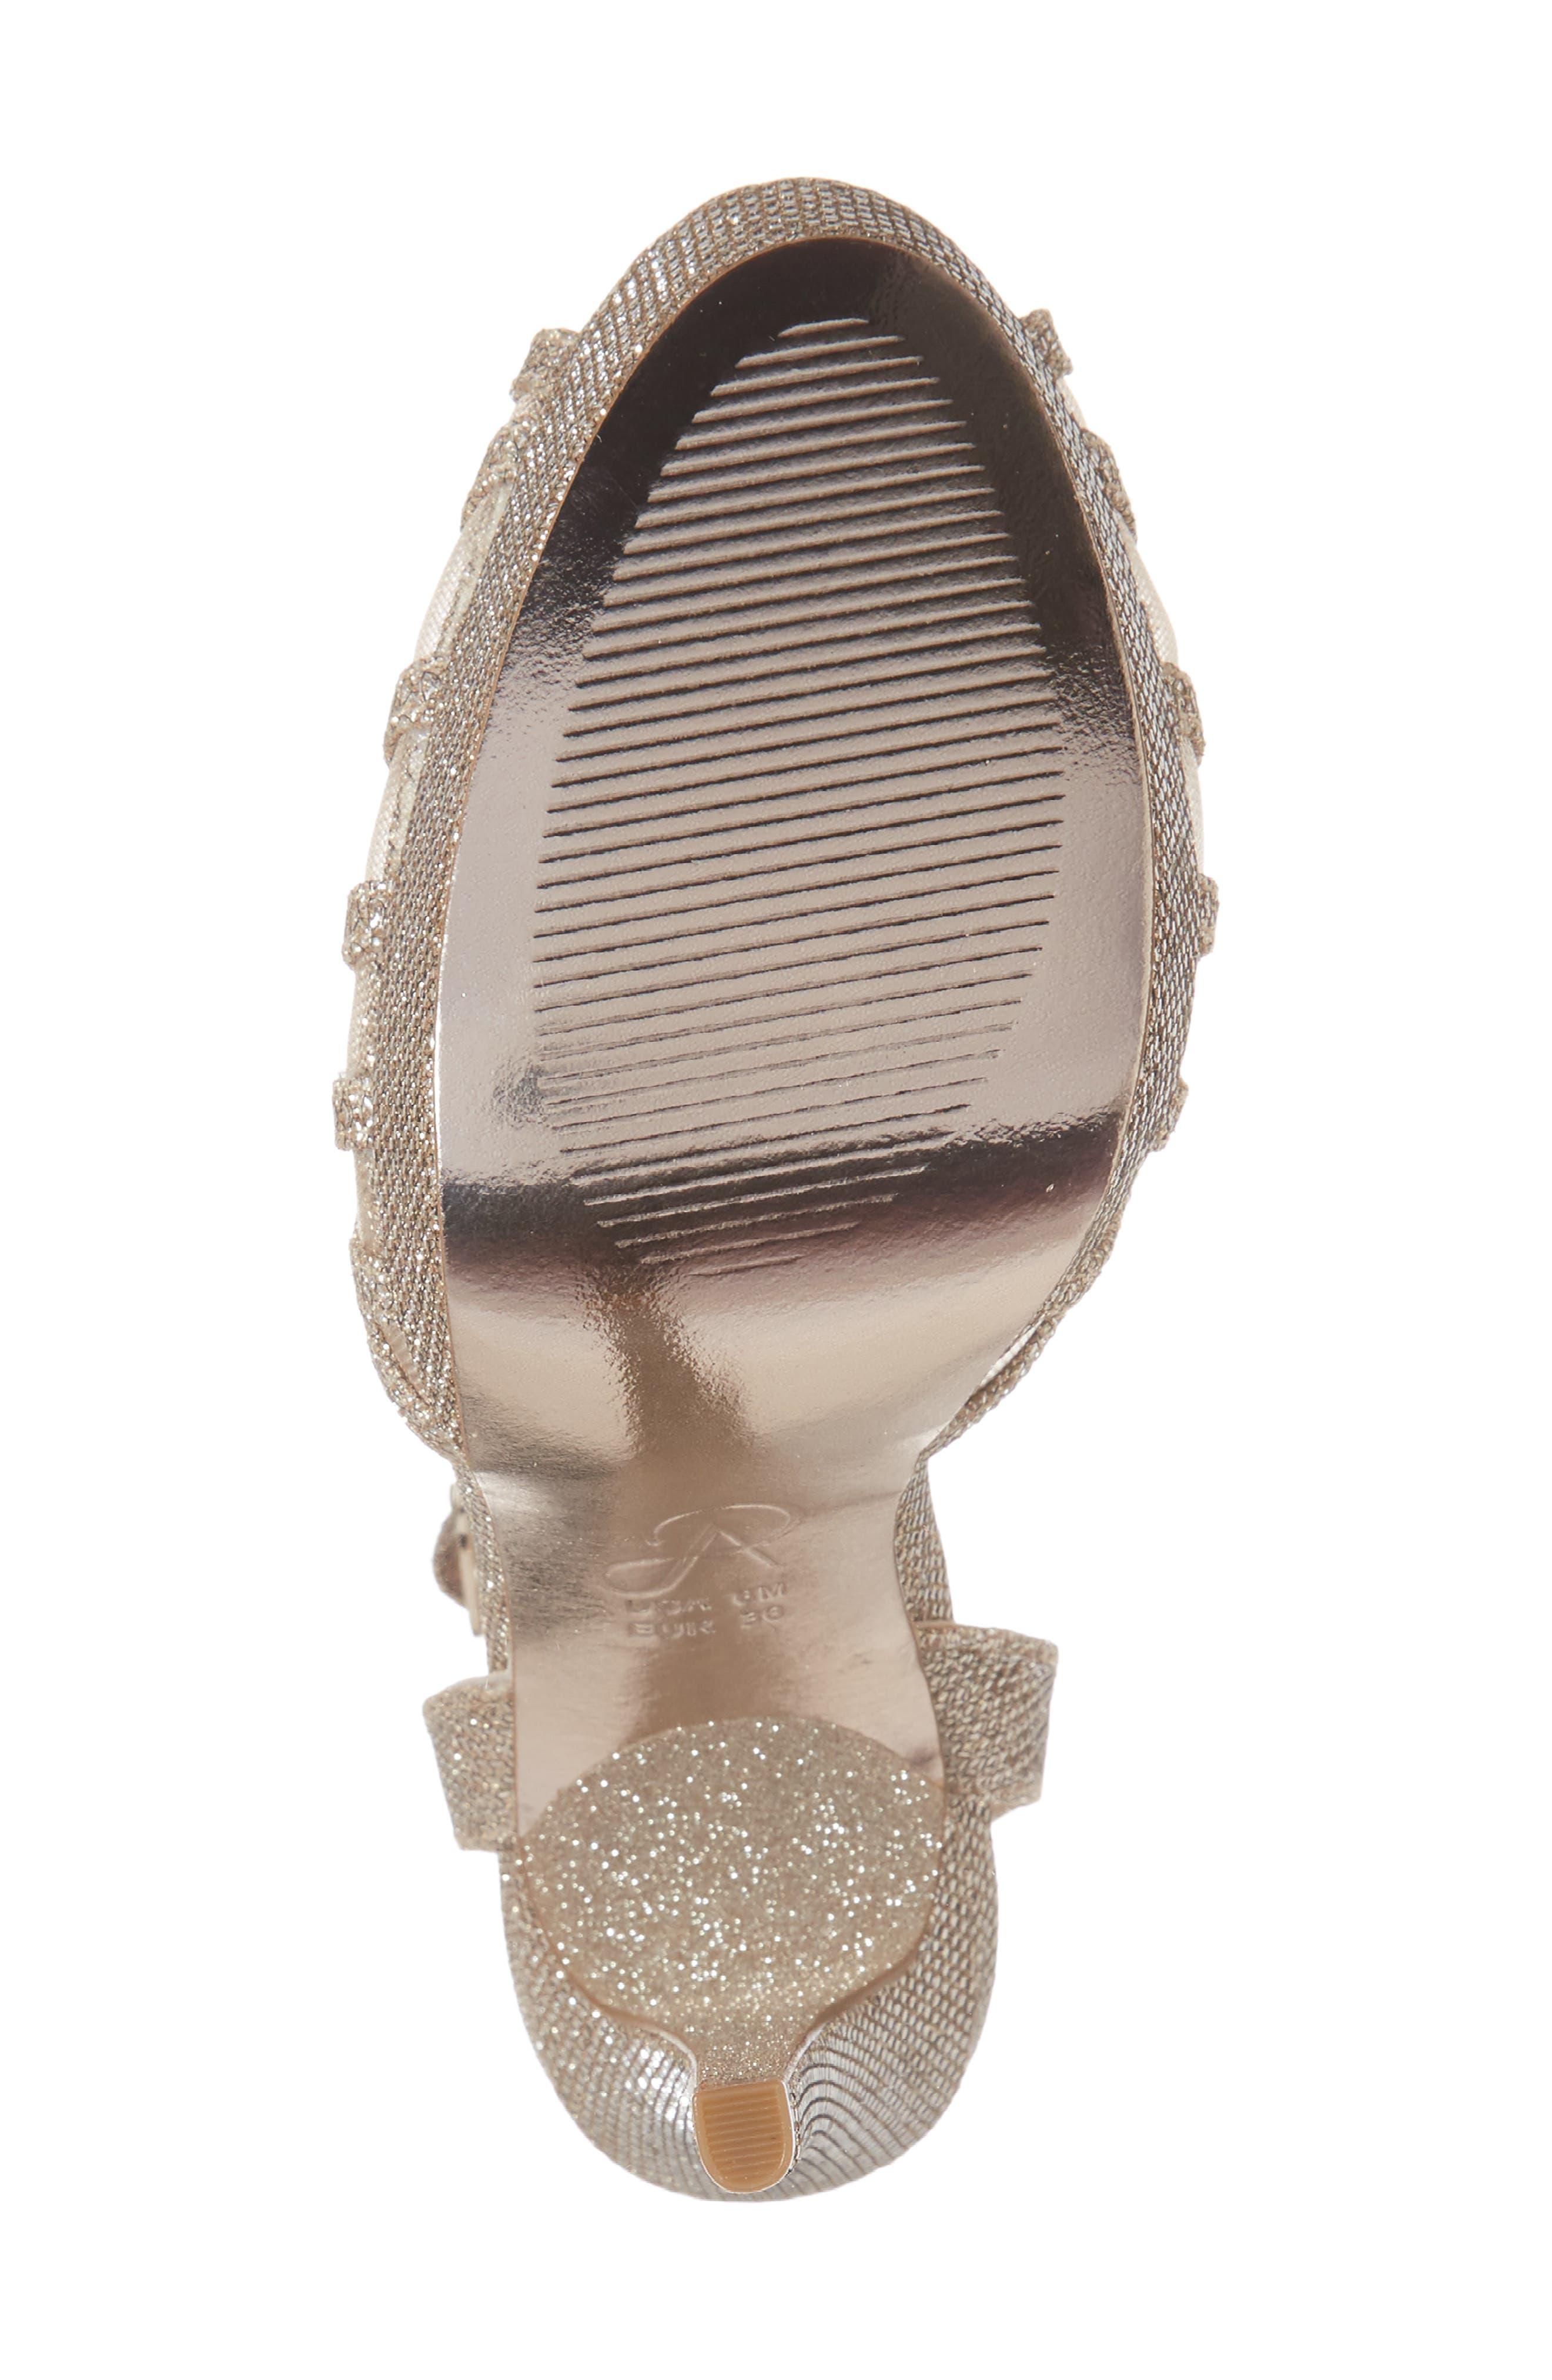 Saida Platform Sandal,                             Alternate thumbnail 6, color,                             040